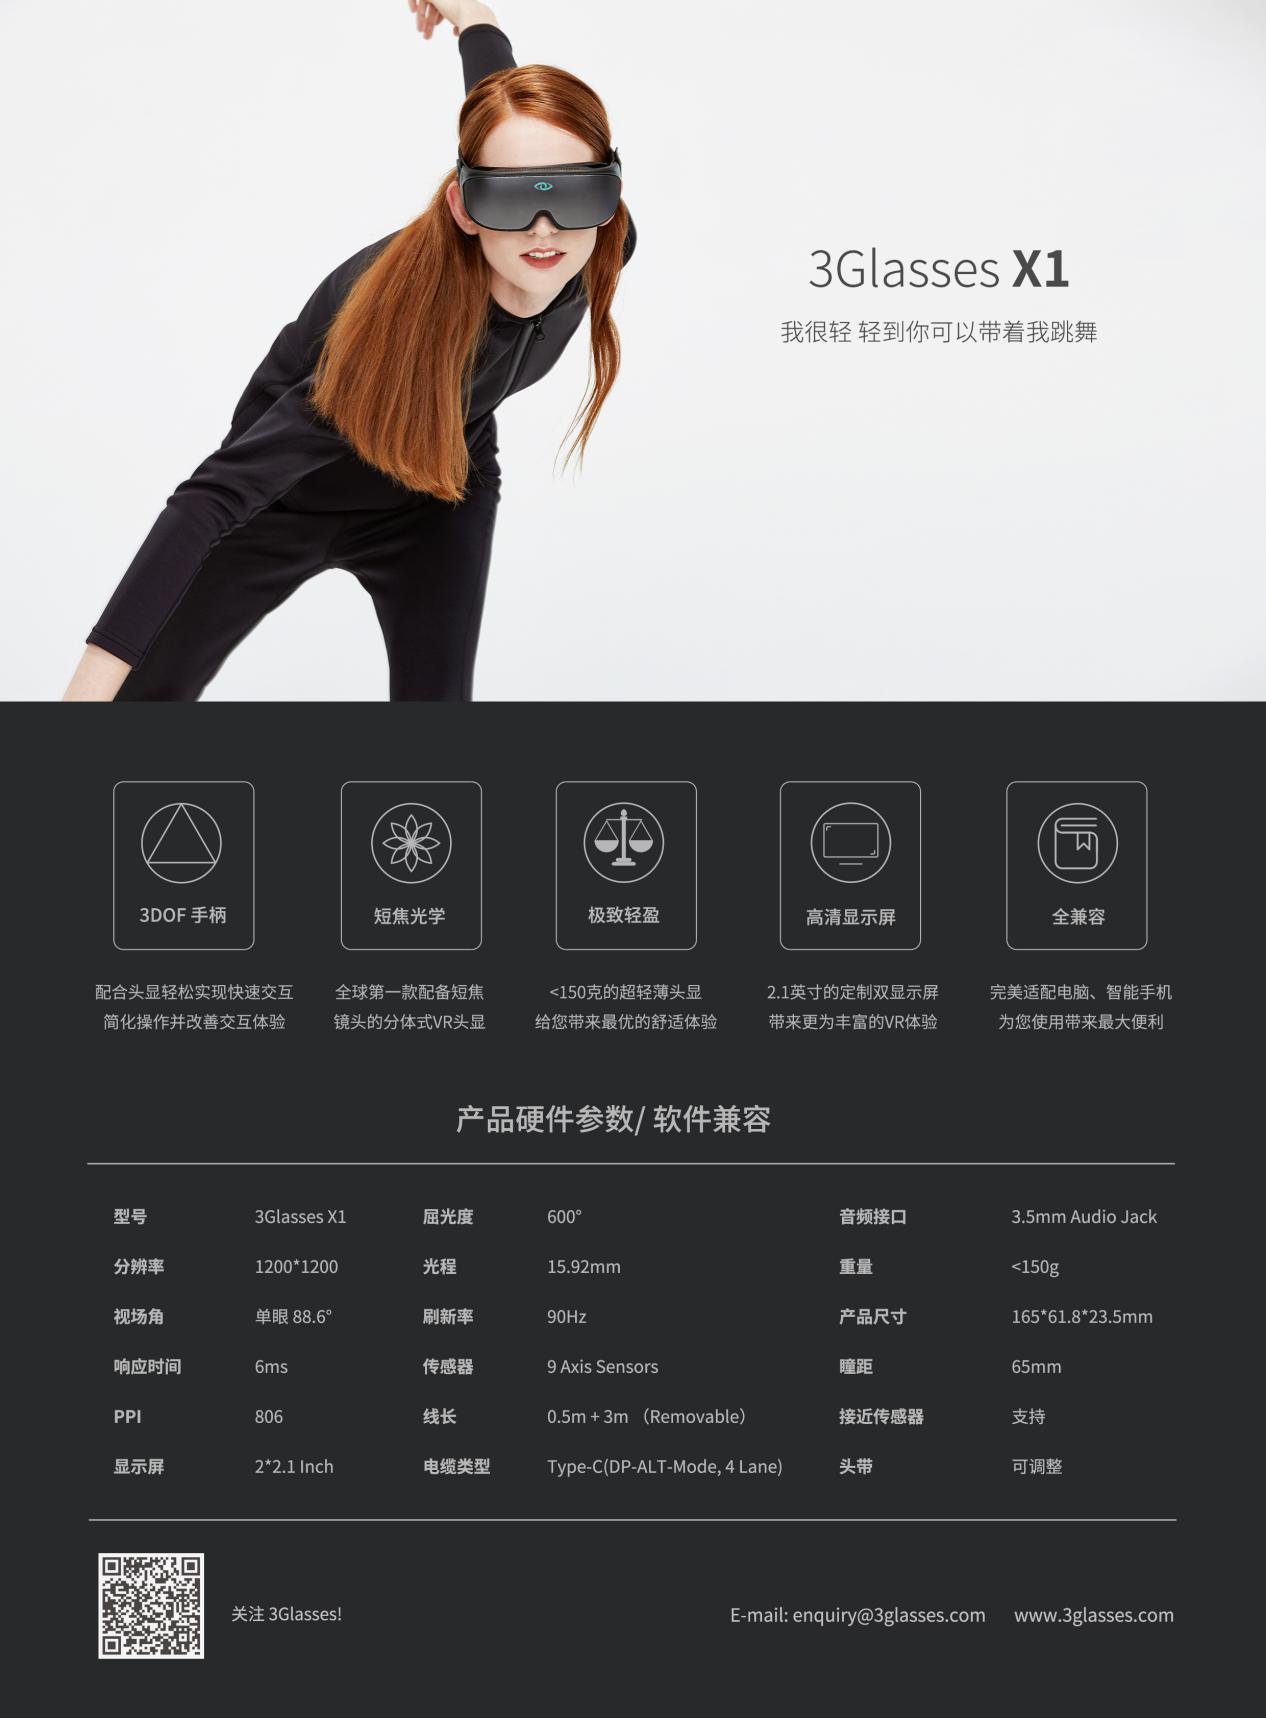 3GlassesX1:全球首款消费级超薄VR眼镜